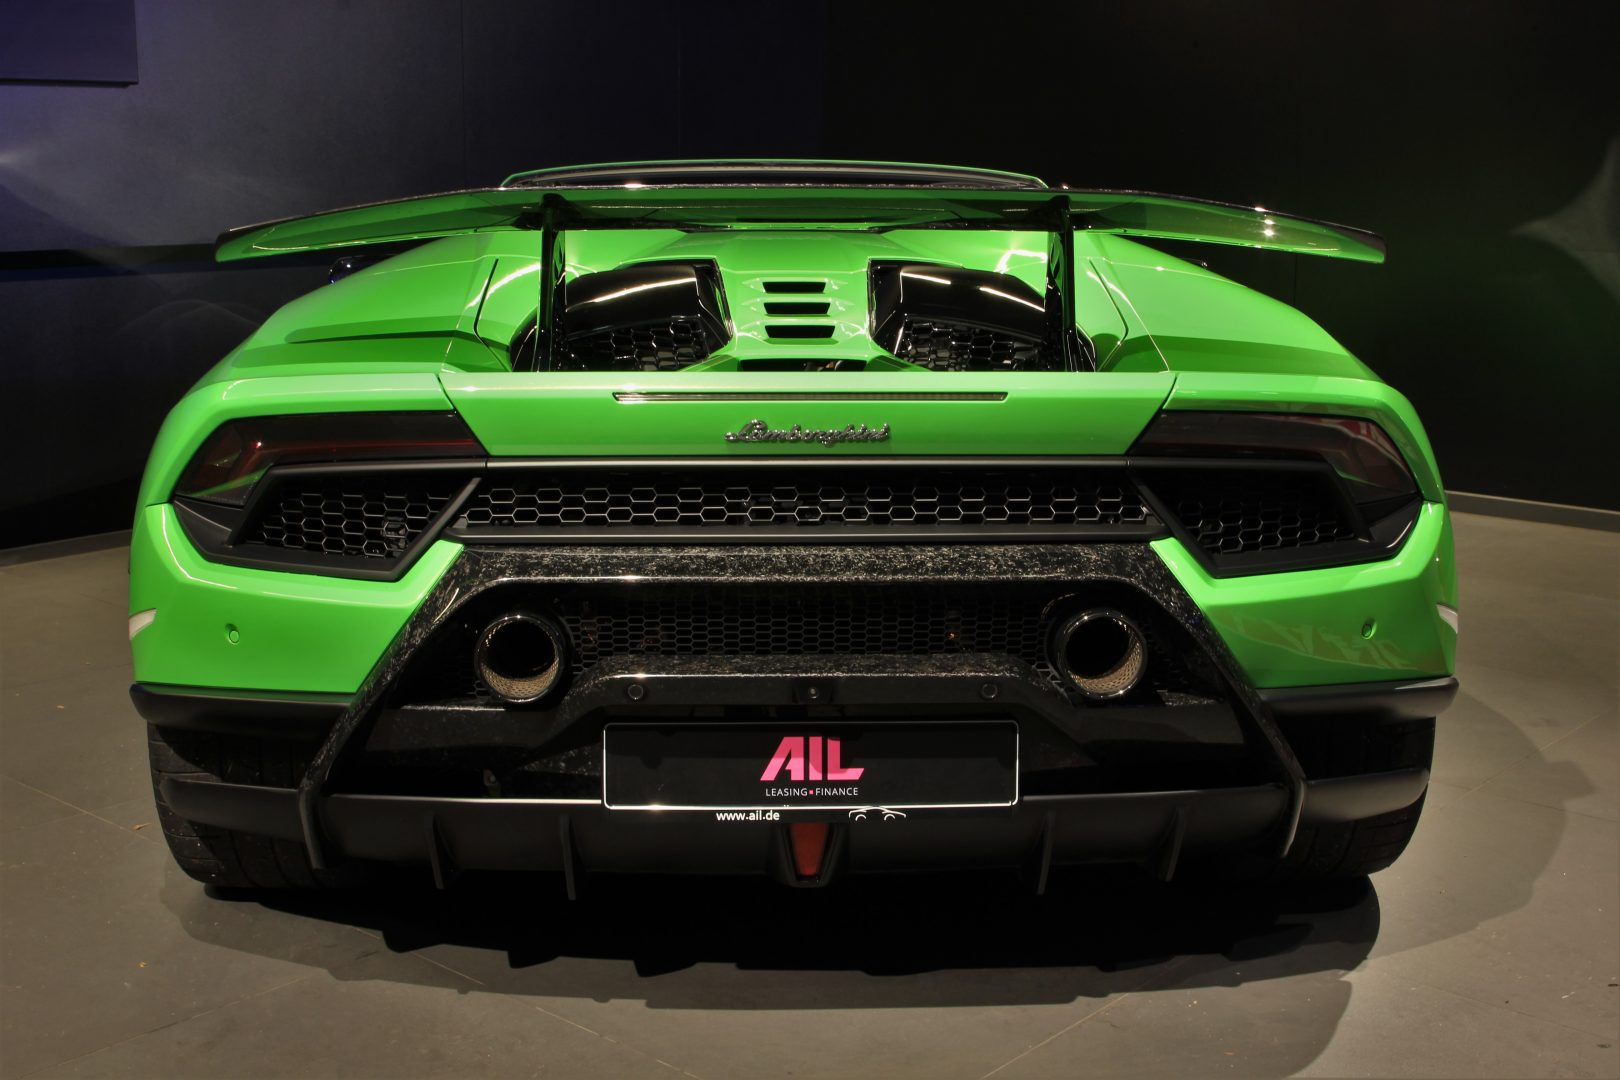 AIL Lamborghini Huracan Performante Spyder LP 640-4 Verda Mantis 5